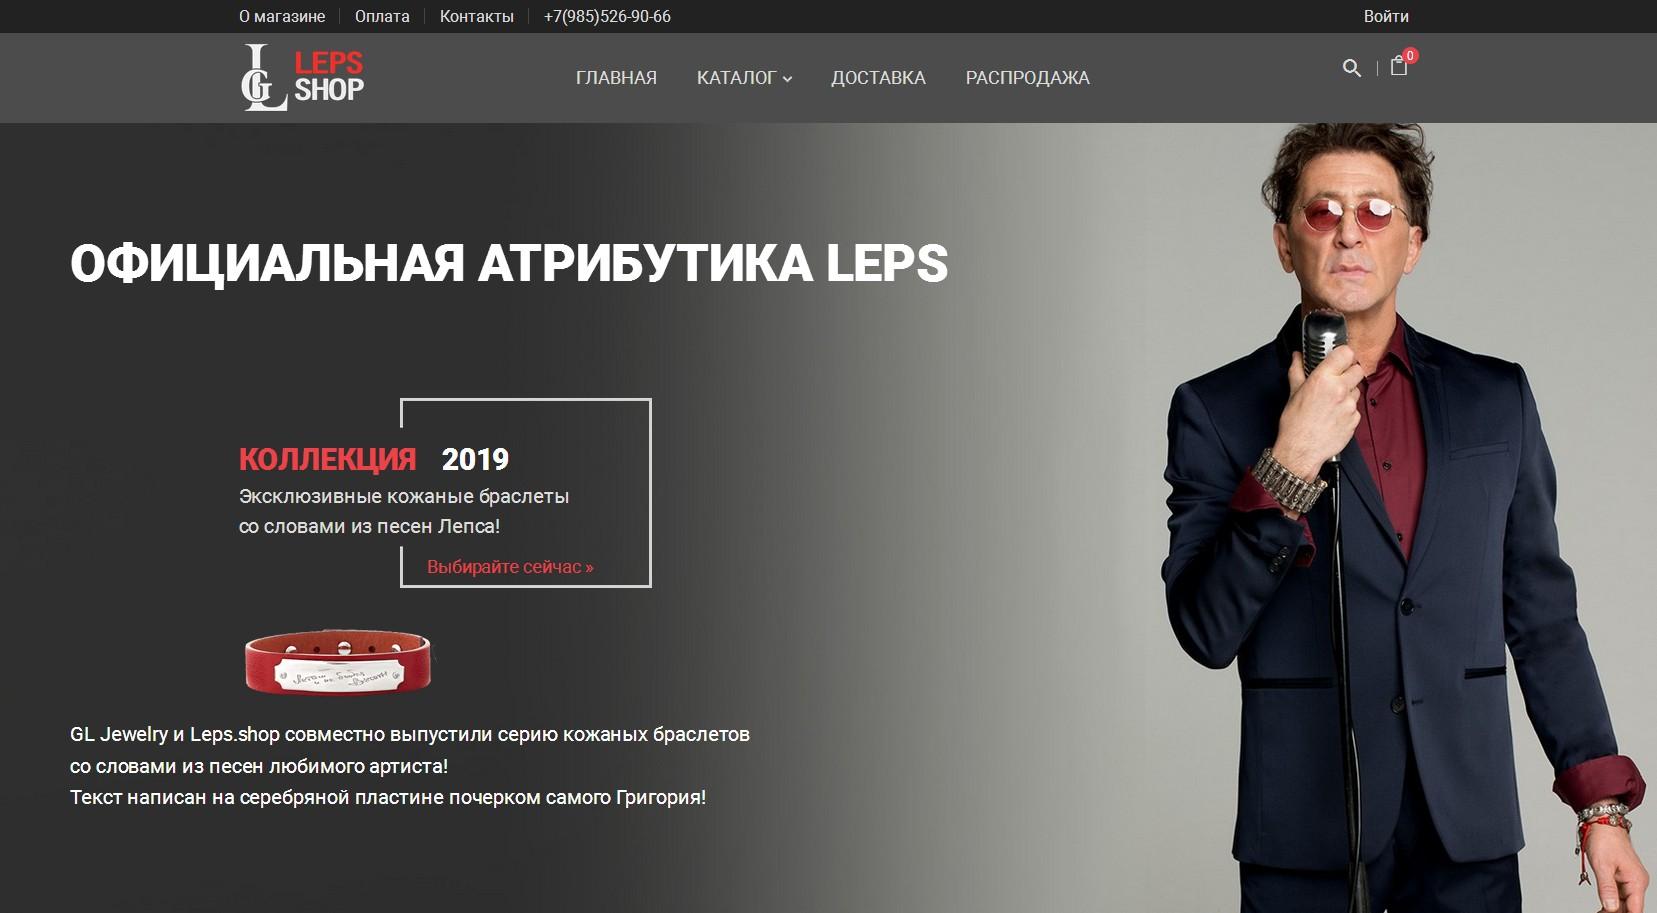 логотип lepsshop.com